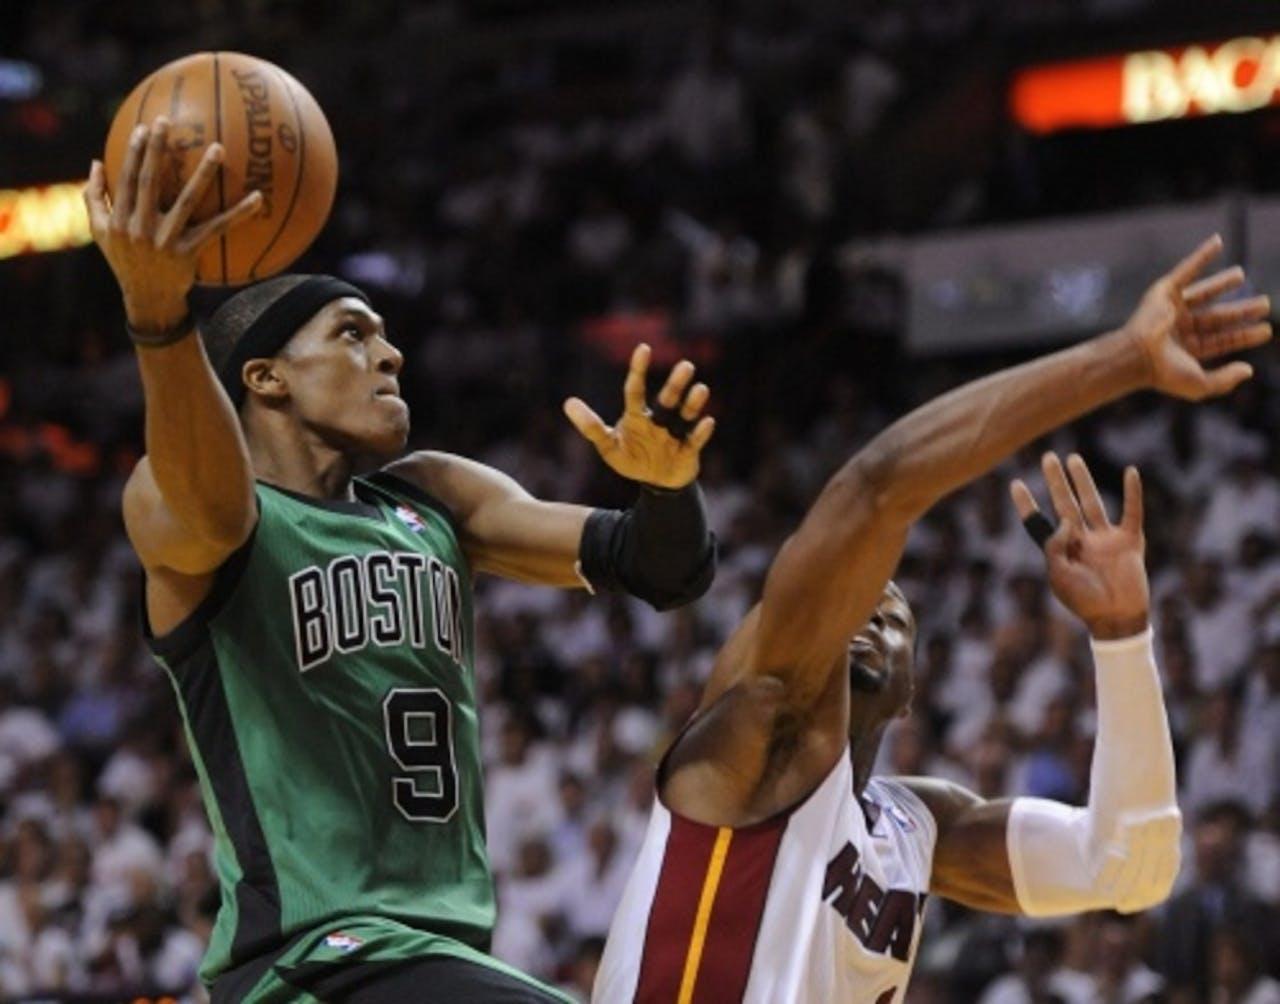 Bolton Celtics-topschutter Rajon Rondo (archieffoto, mei 2012). EPA